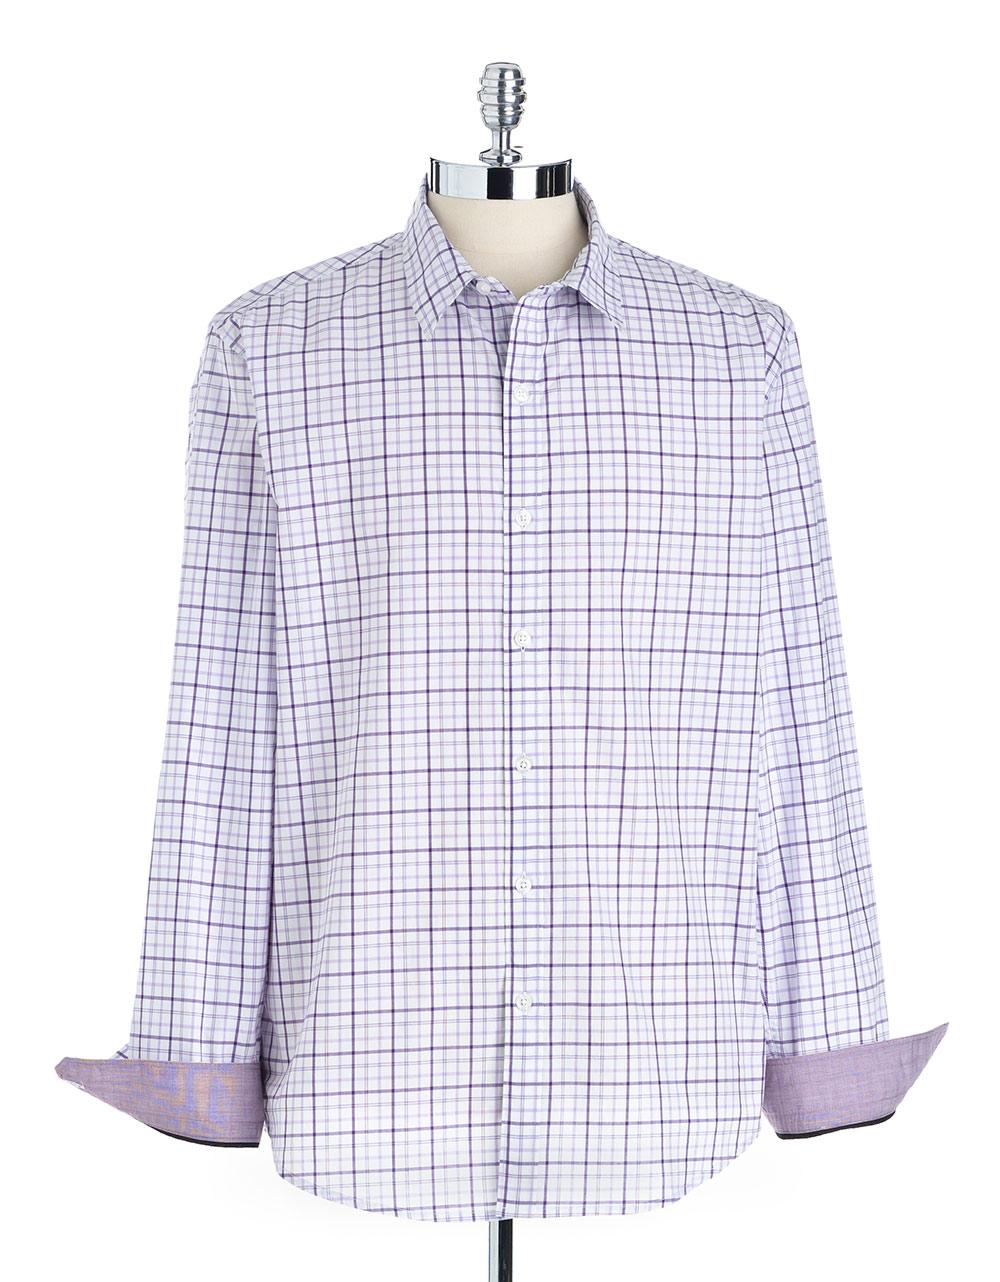 Dkny Plaid Buttondown Shirt In Purple For Men Lyst